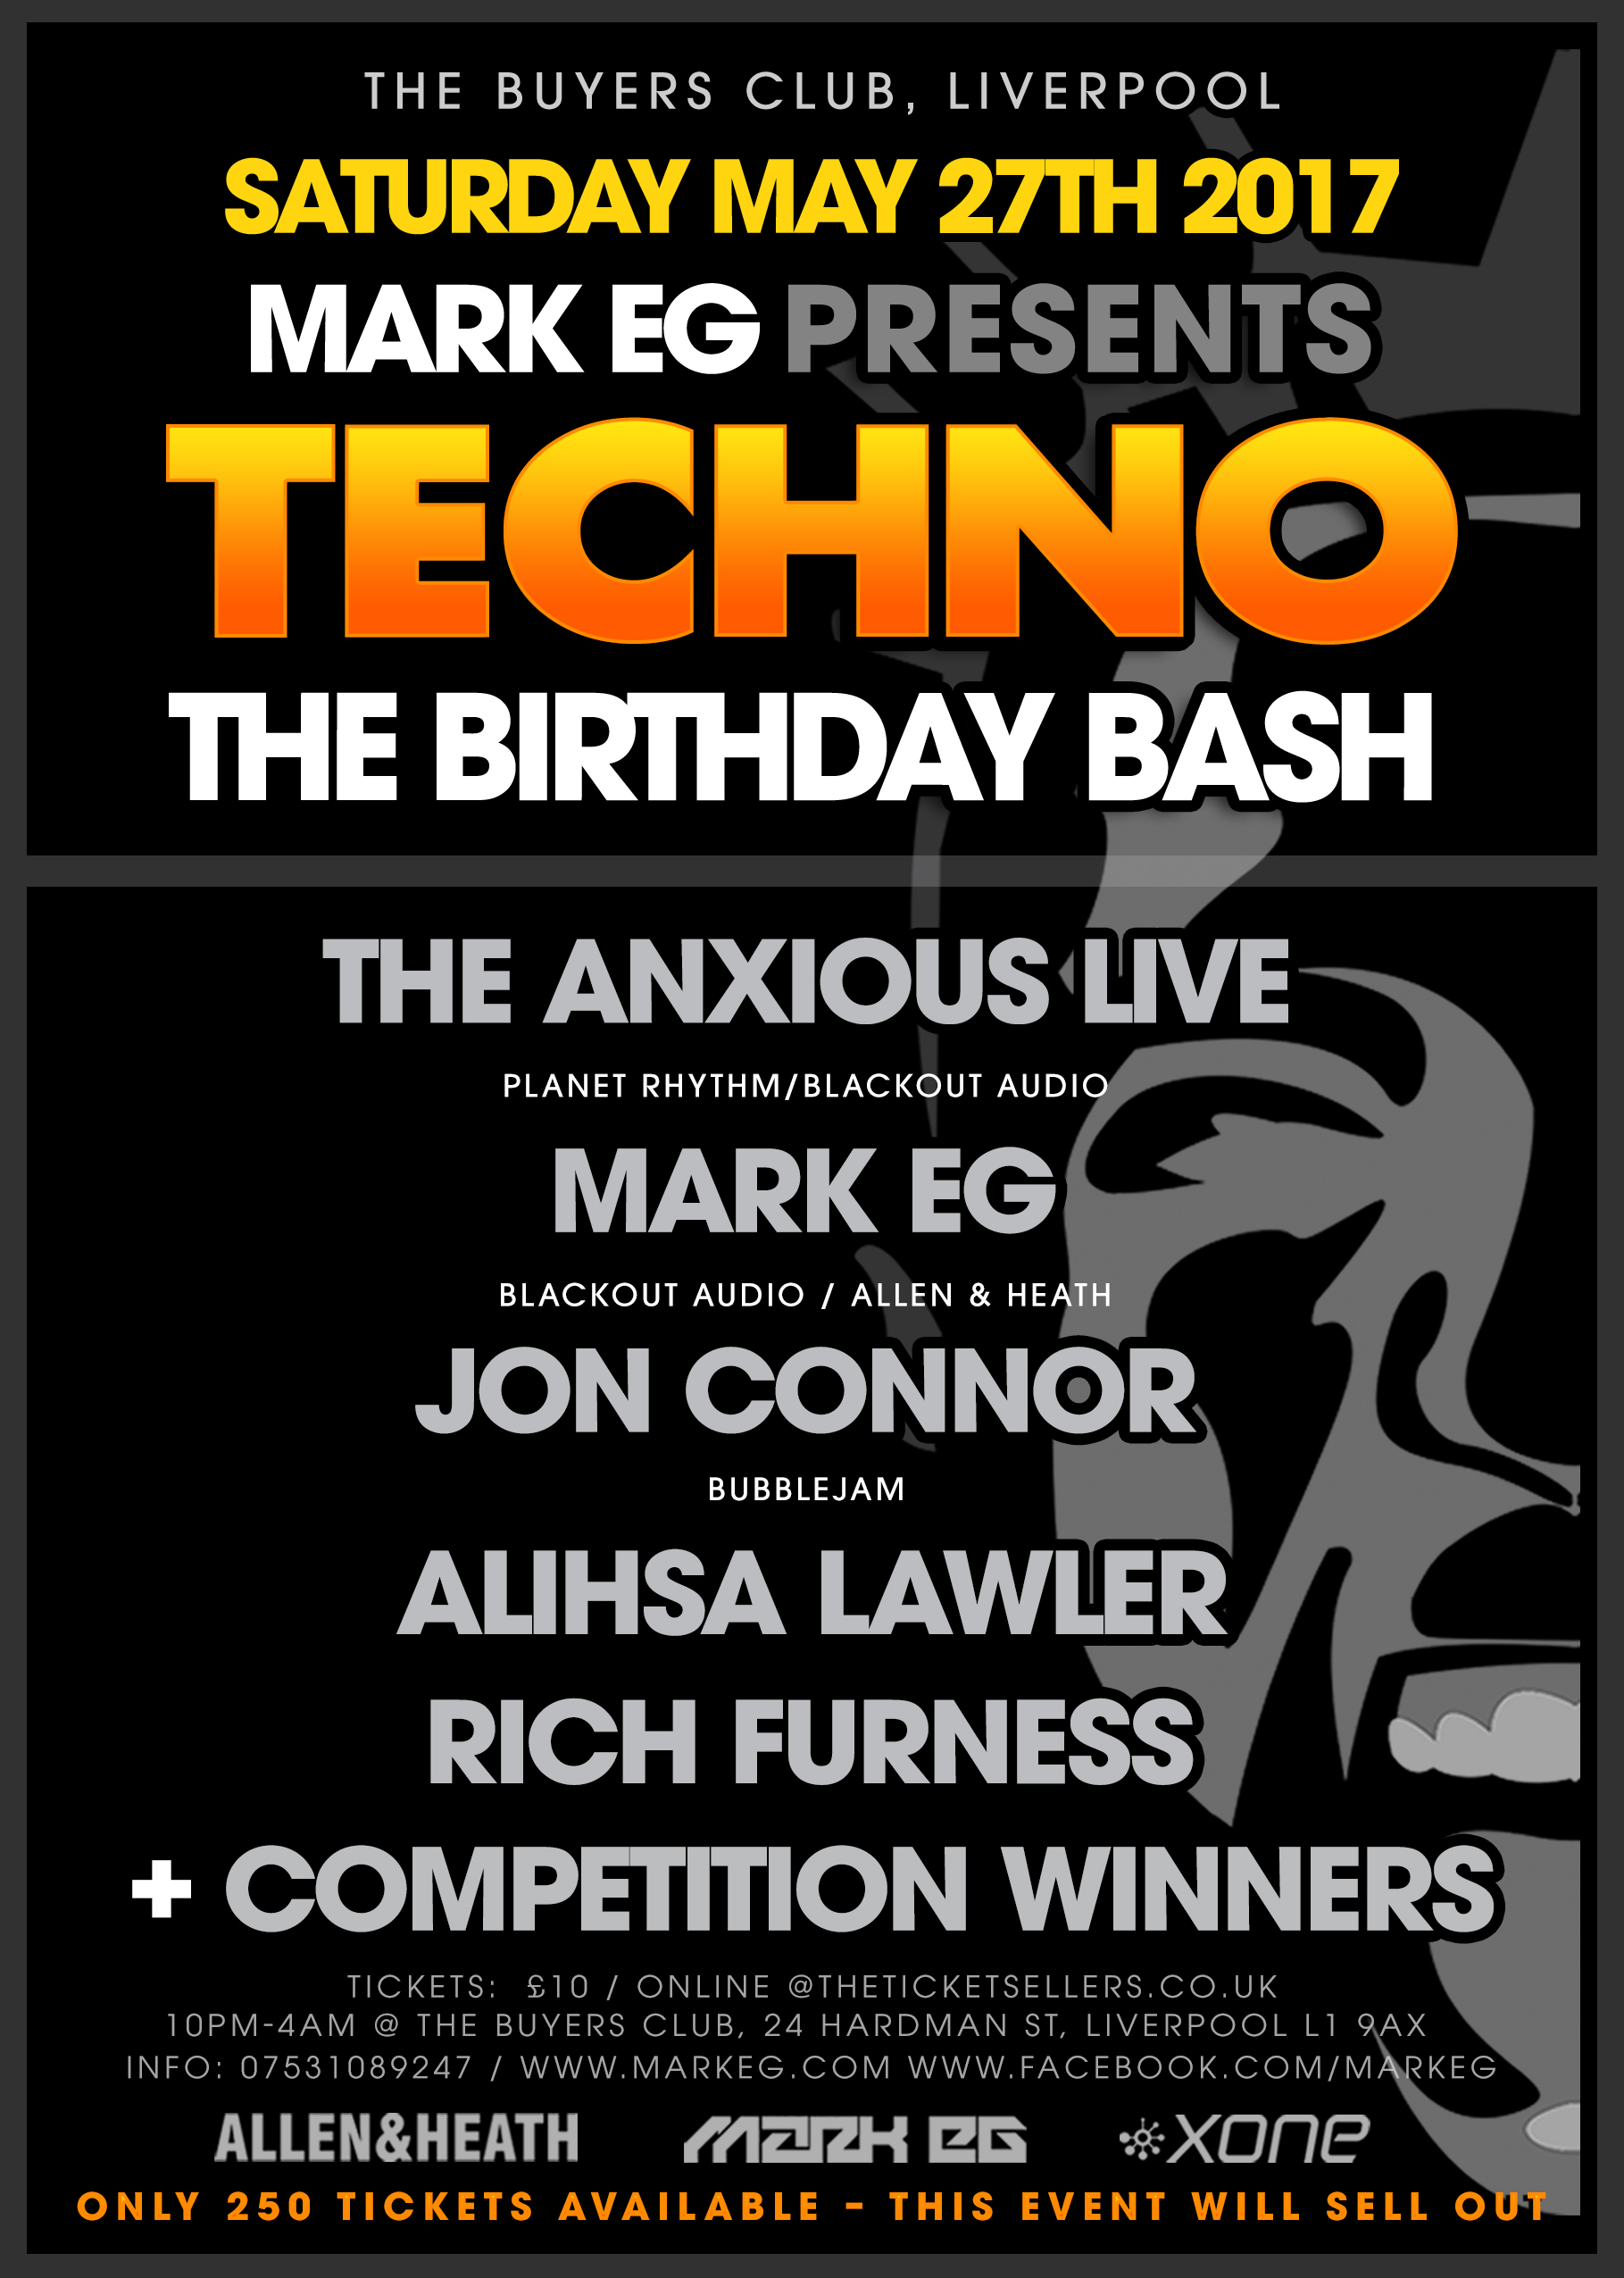 Mark Eg Presents Techno The Birthday Bash At The Buyers